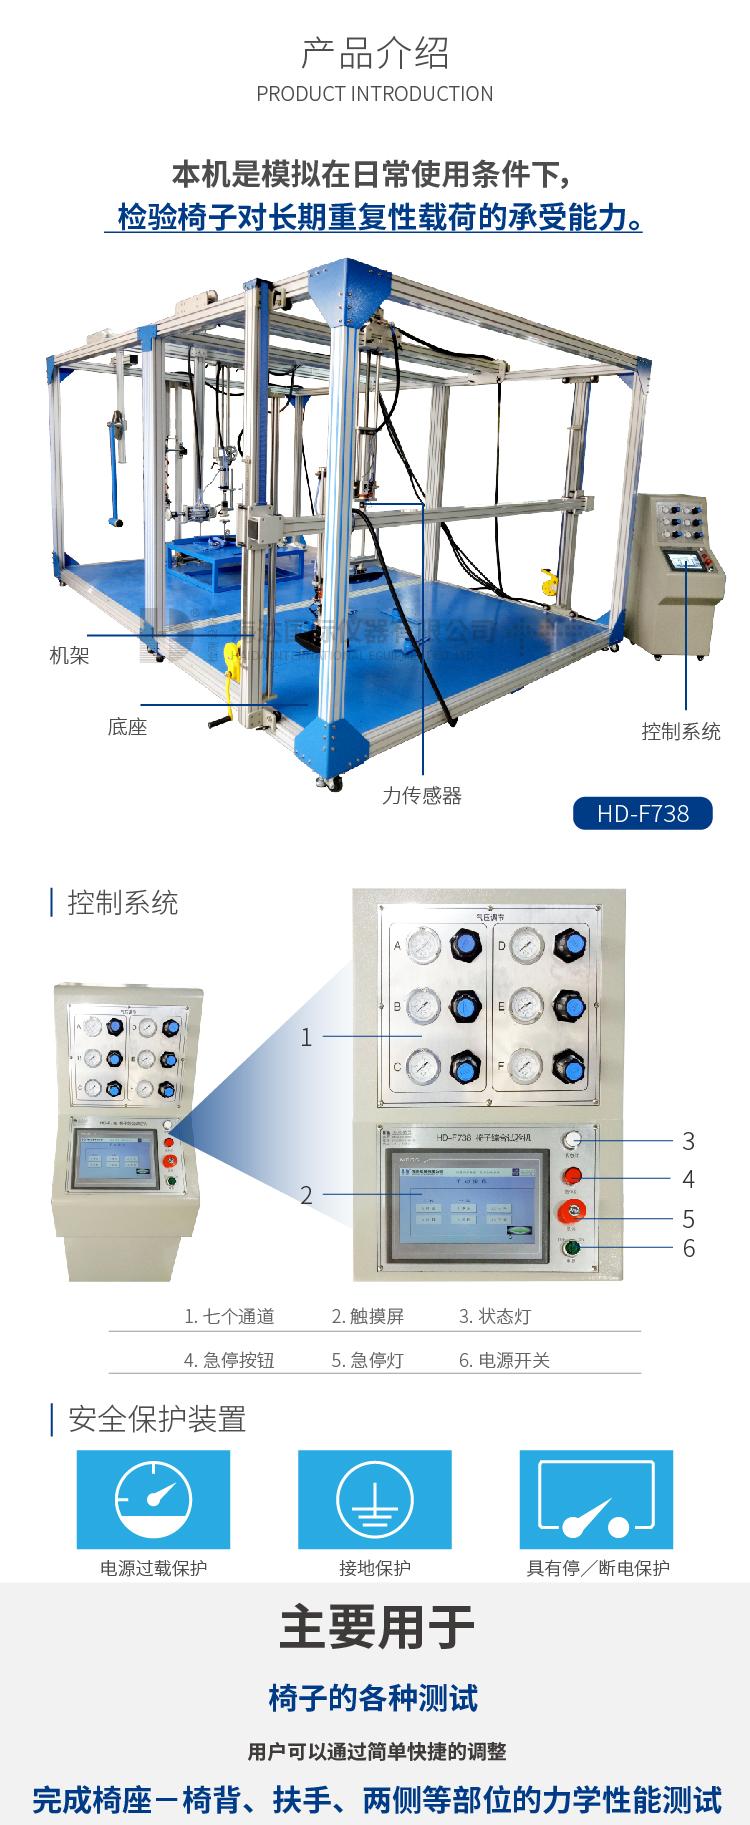 HD-F738 椅子综合测试仪_02.jpg